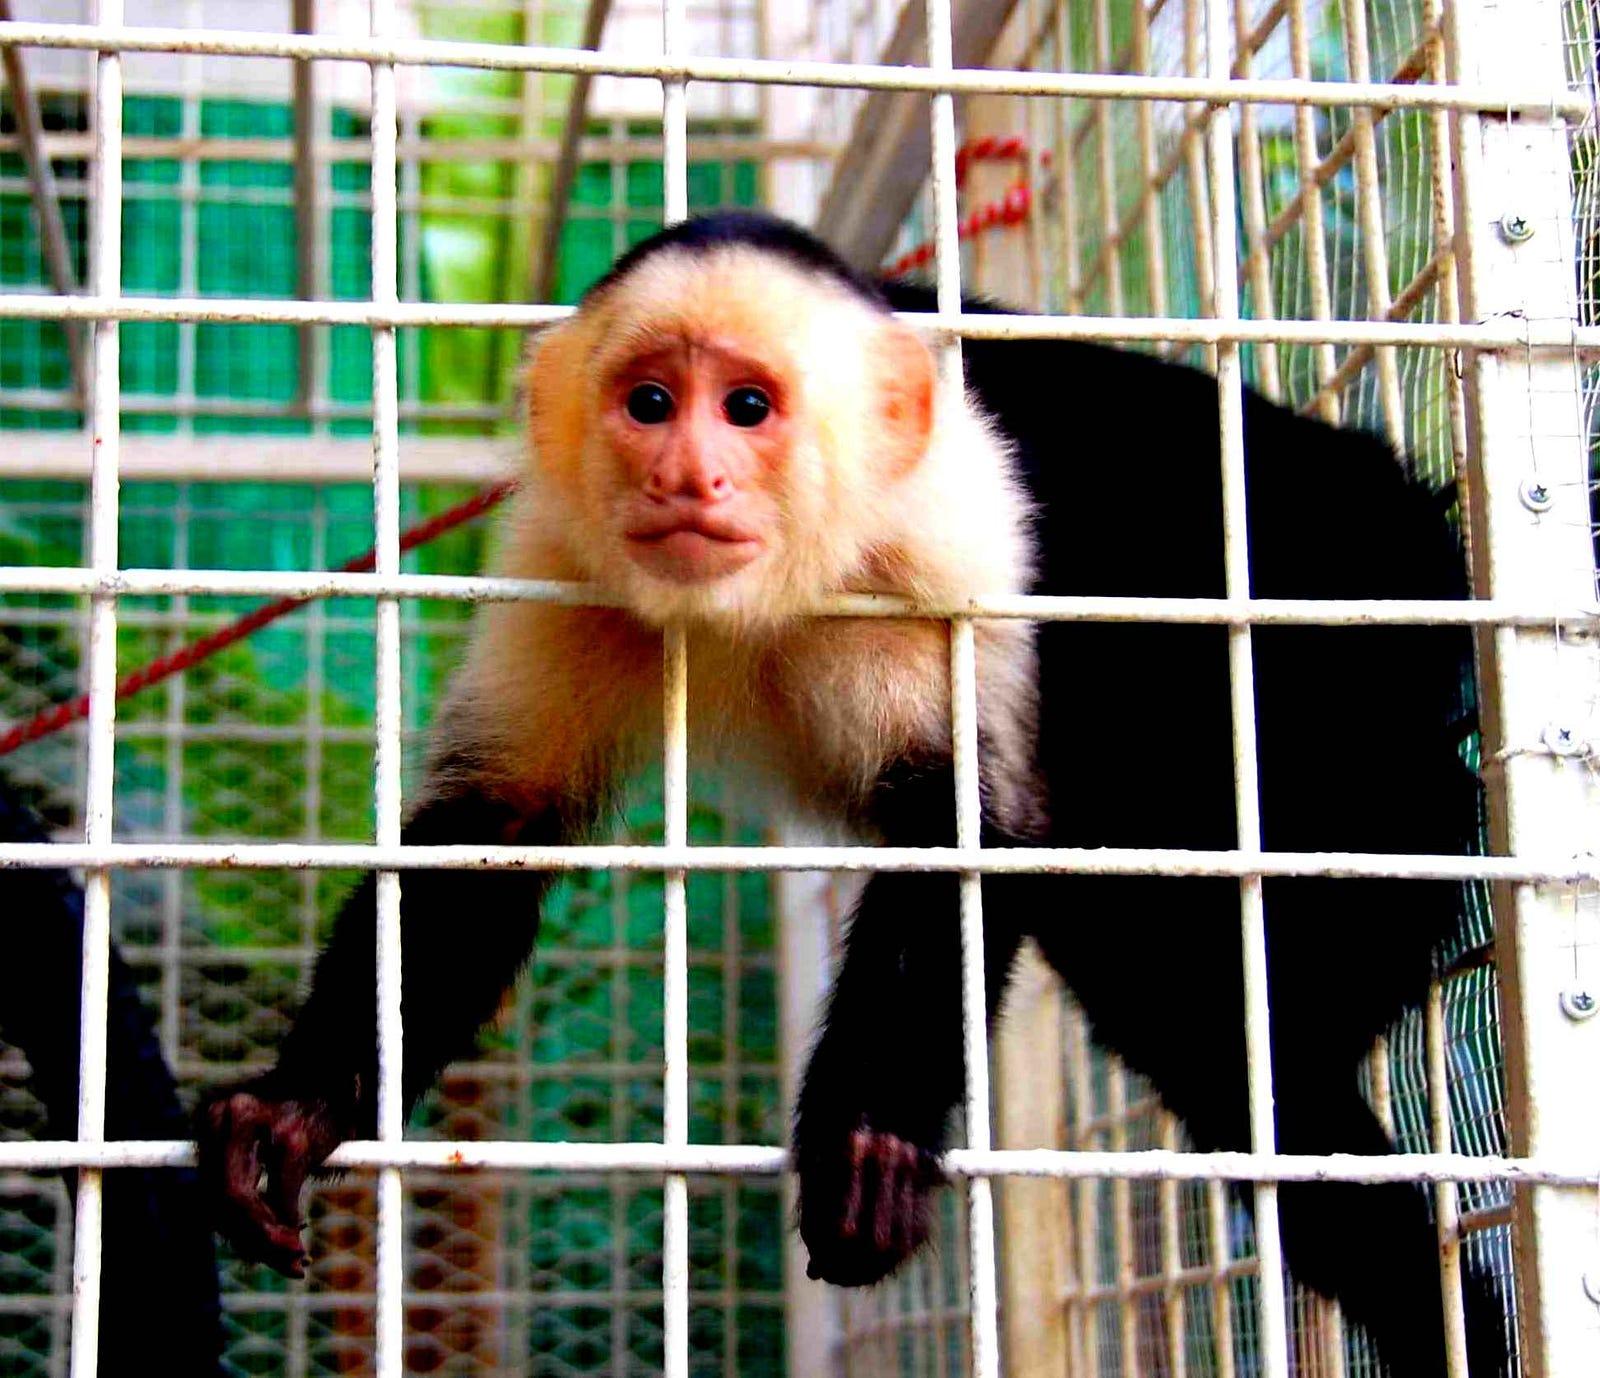 Fullsize Of Max The Monkey